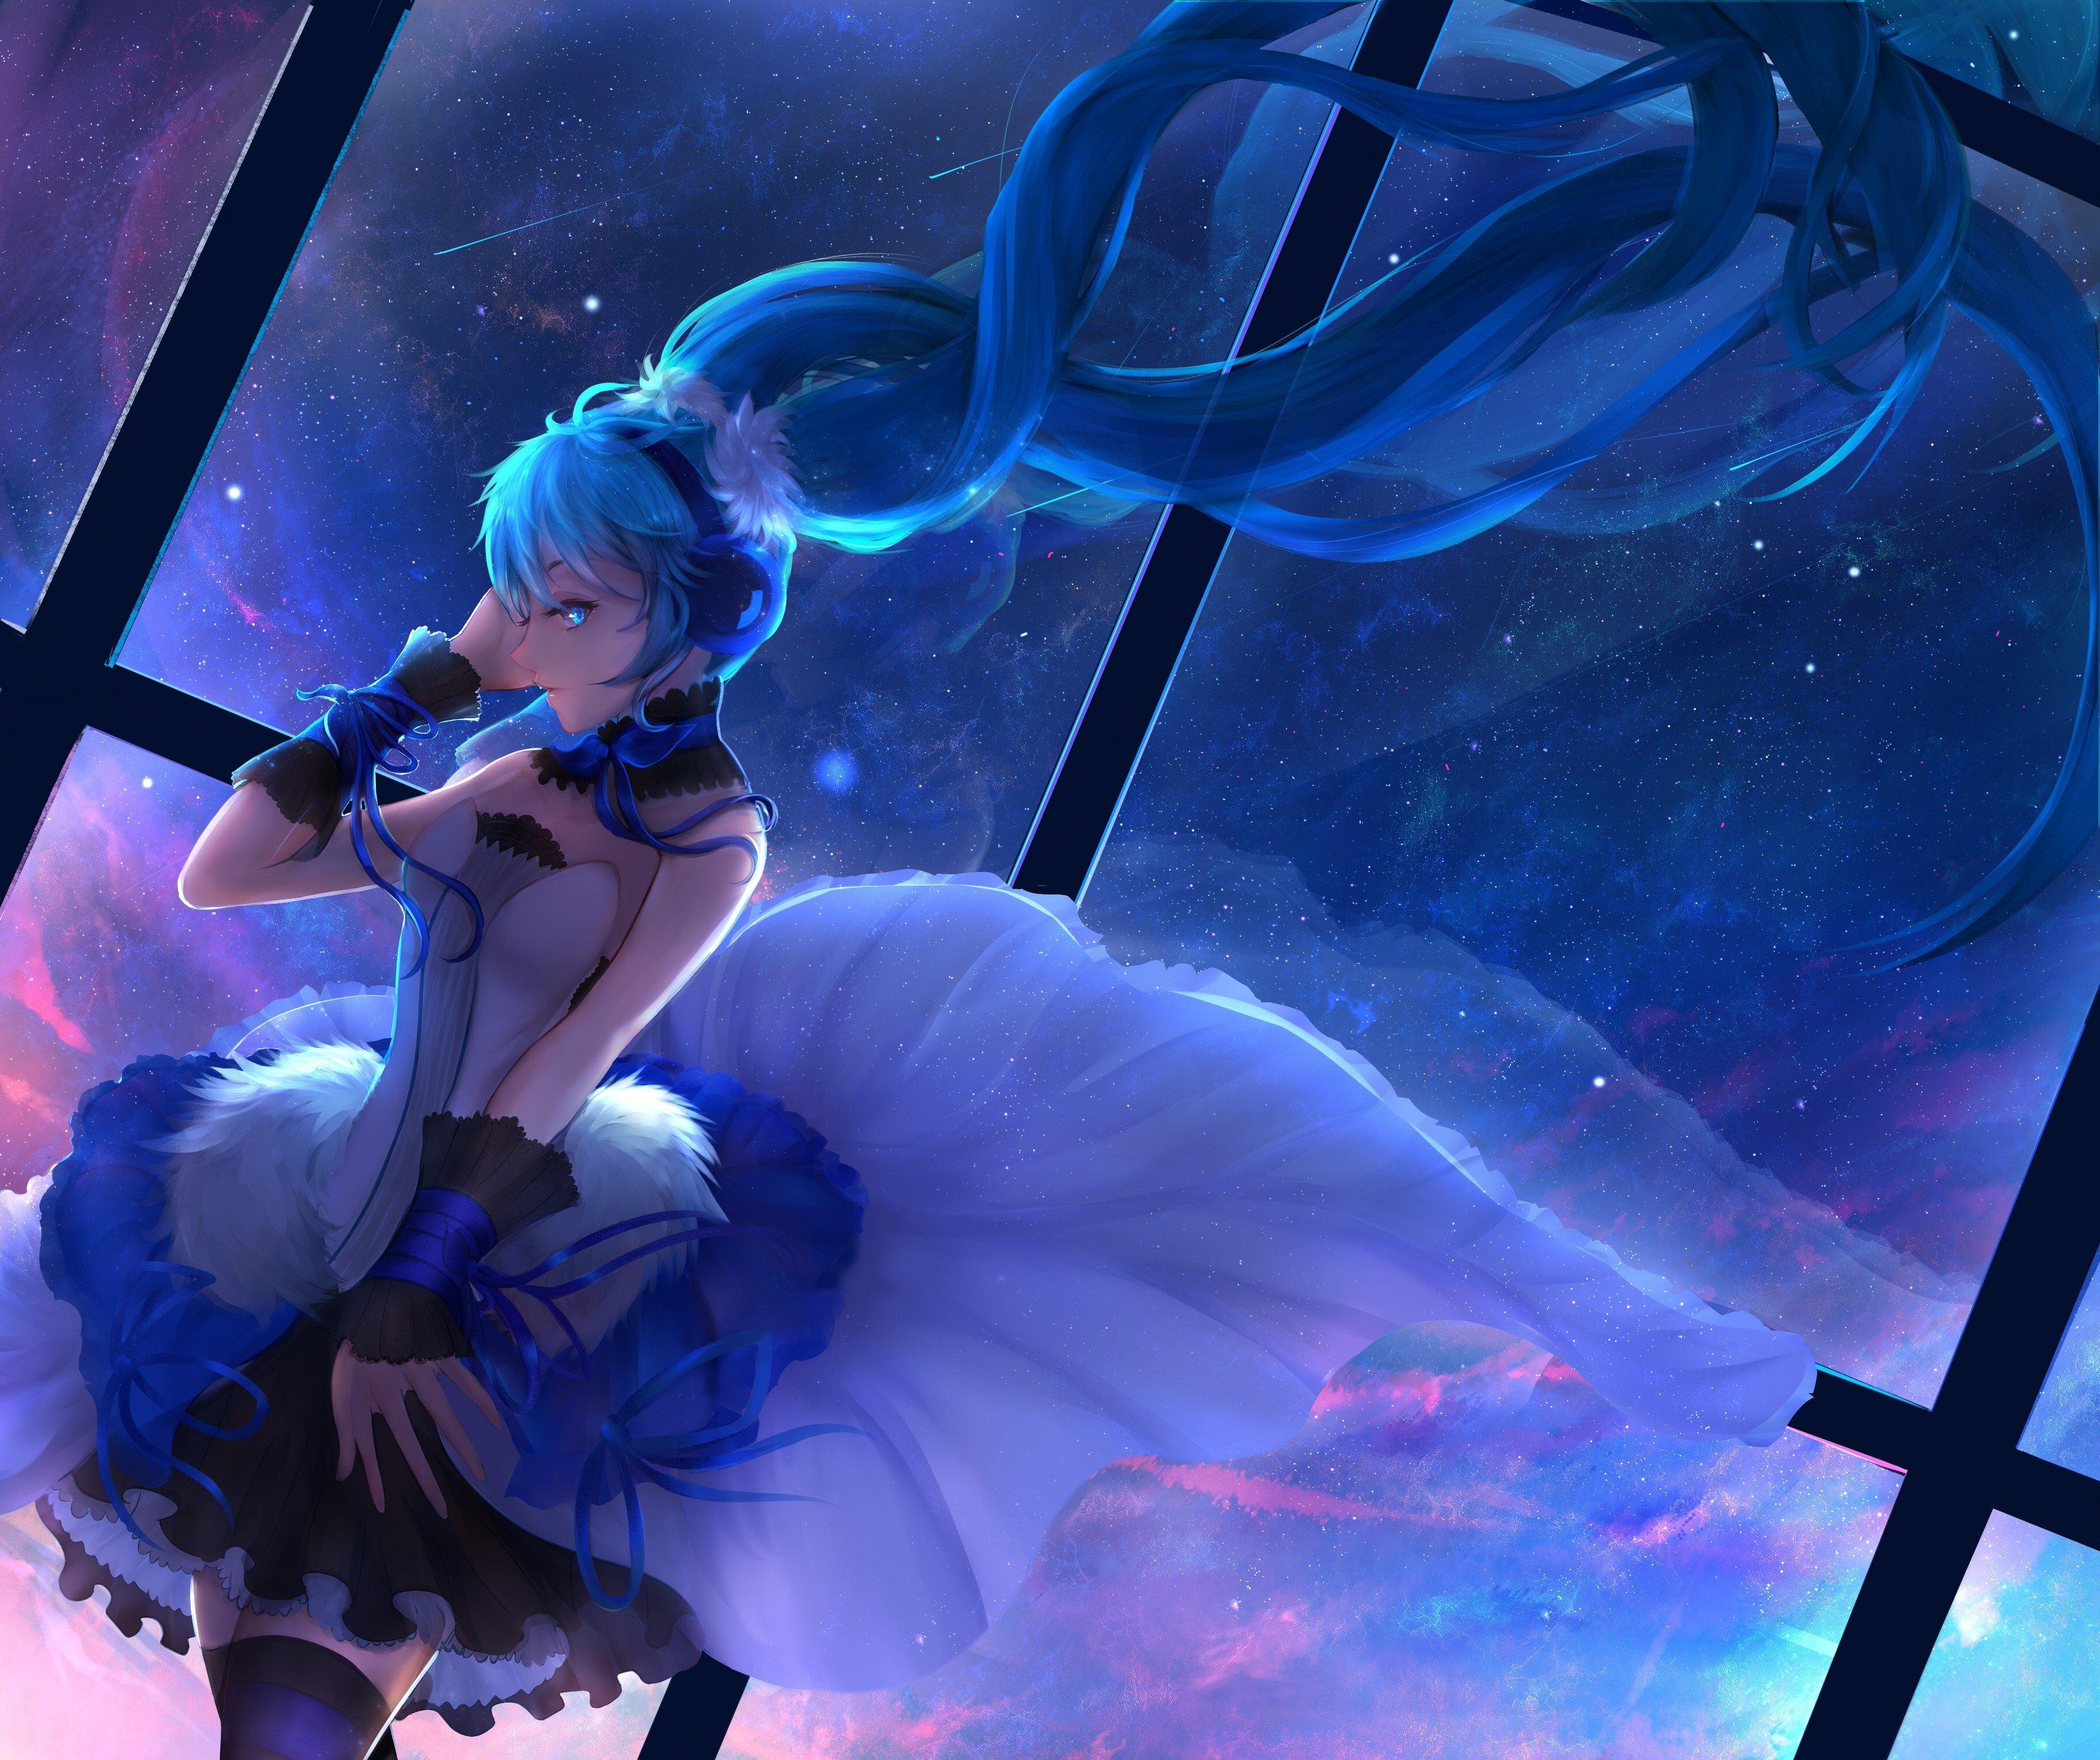 Anime, Girl, Singing, Hatsune Miku, Vocaloid, 4k Wallpaper